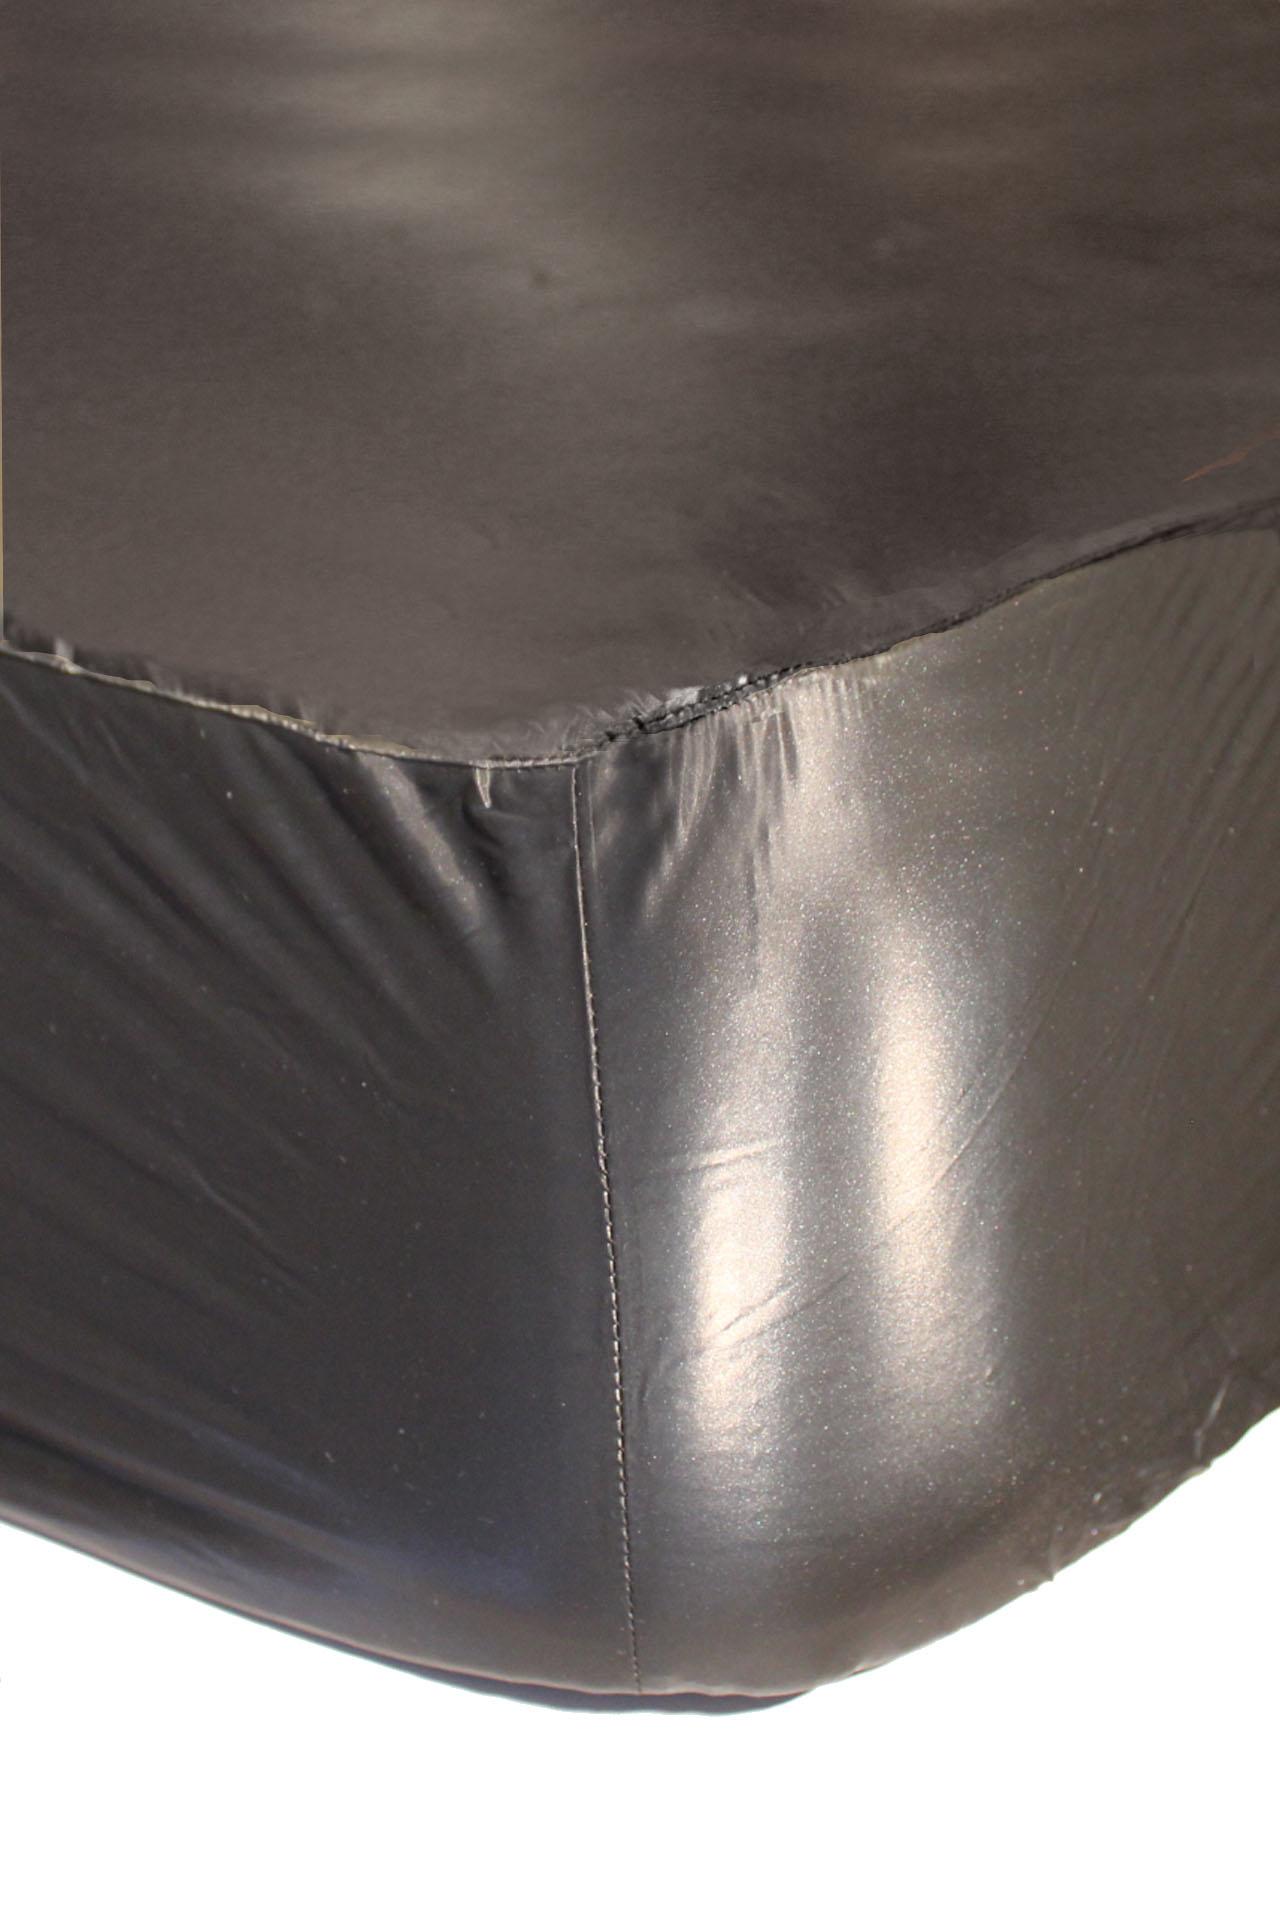 pvc bettlaken 90x200x30 cm schwarz. Black Bedroom Furniture Sets. Home Design Ideas